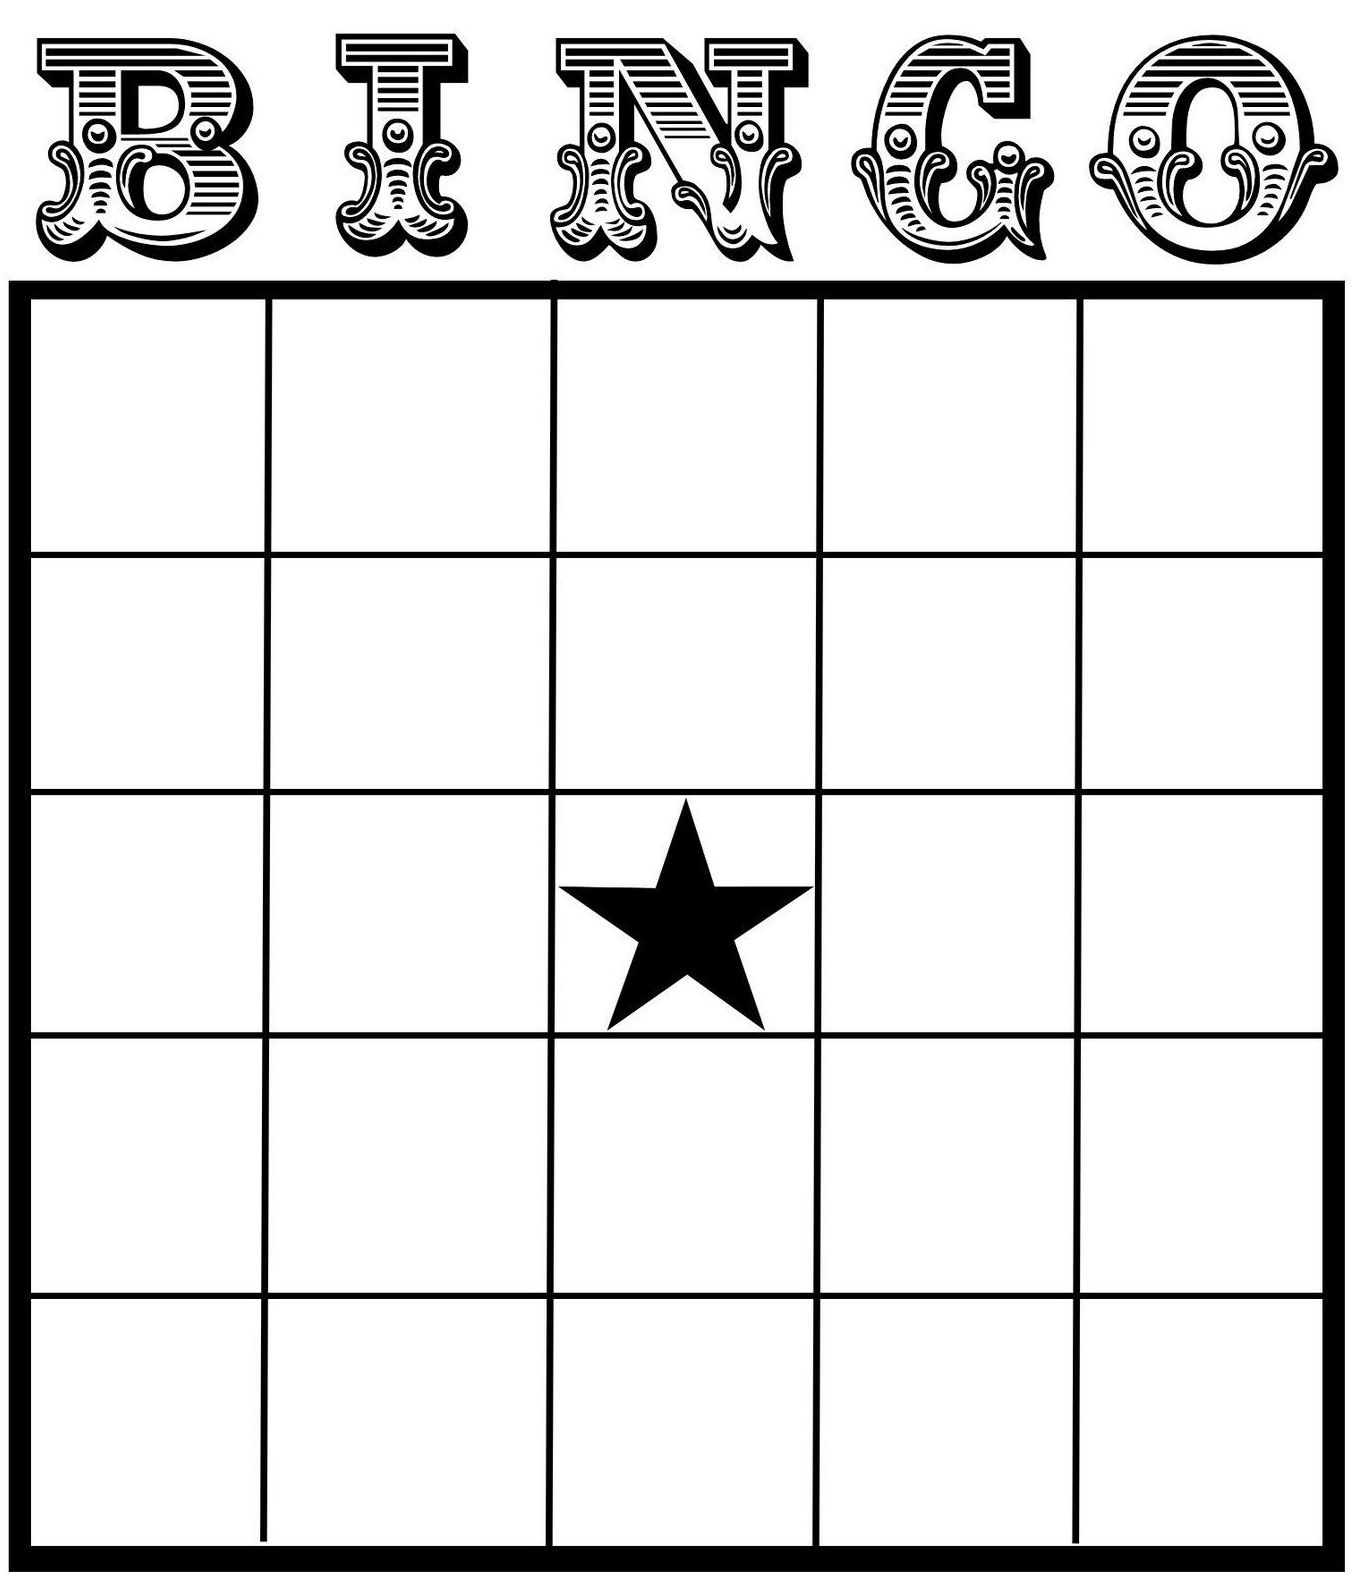 Printable Blank Bingo Cards 21x21  Printable Bingo Cards With Regard To Blank Bingo Template Pdf